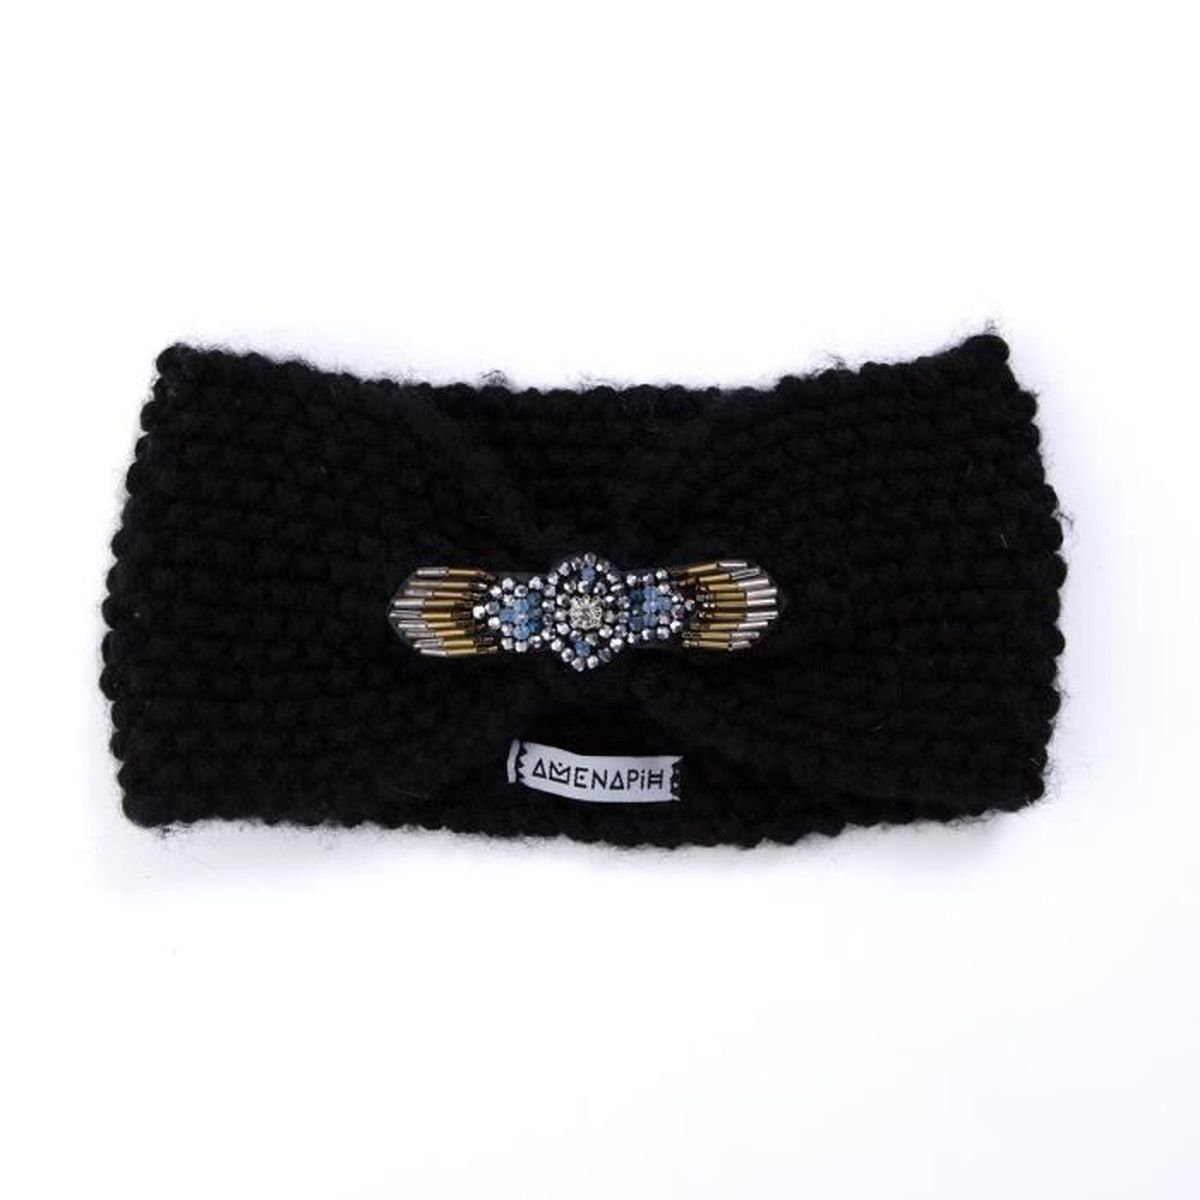 headband foxy noir amenapih by hipanema achat vente bandeau serre t te headband foxy noir. Black Bedroom Furniture Sets. Home Design Ideas